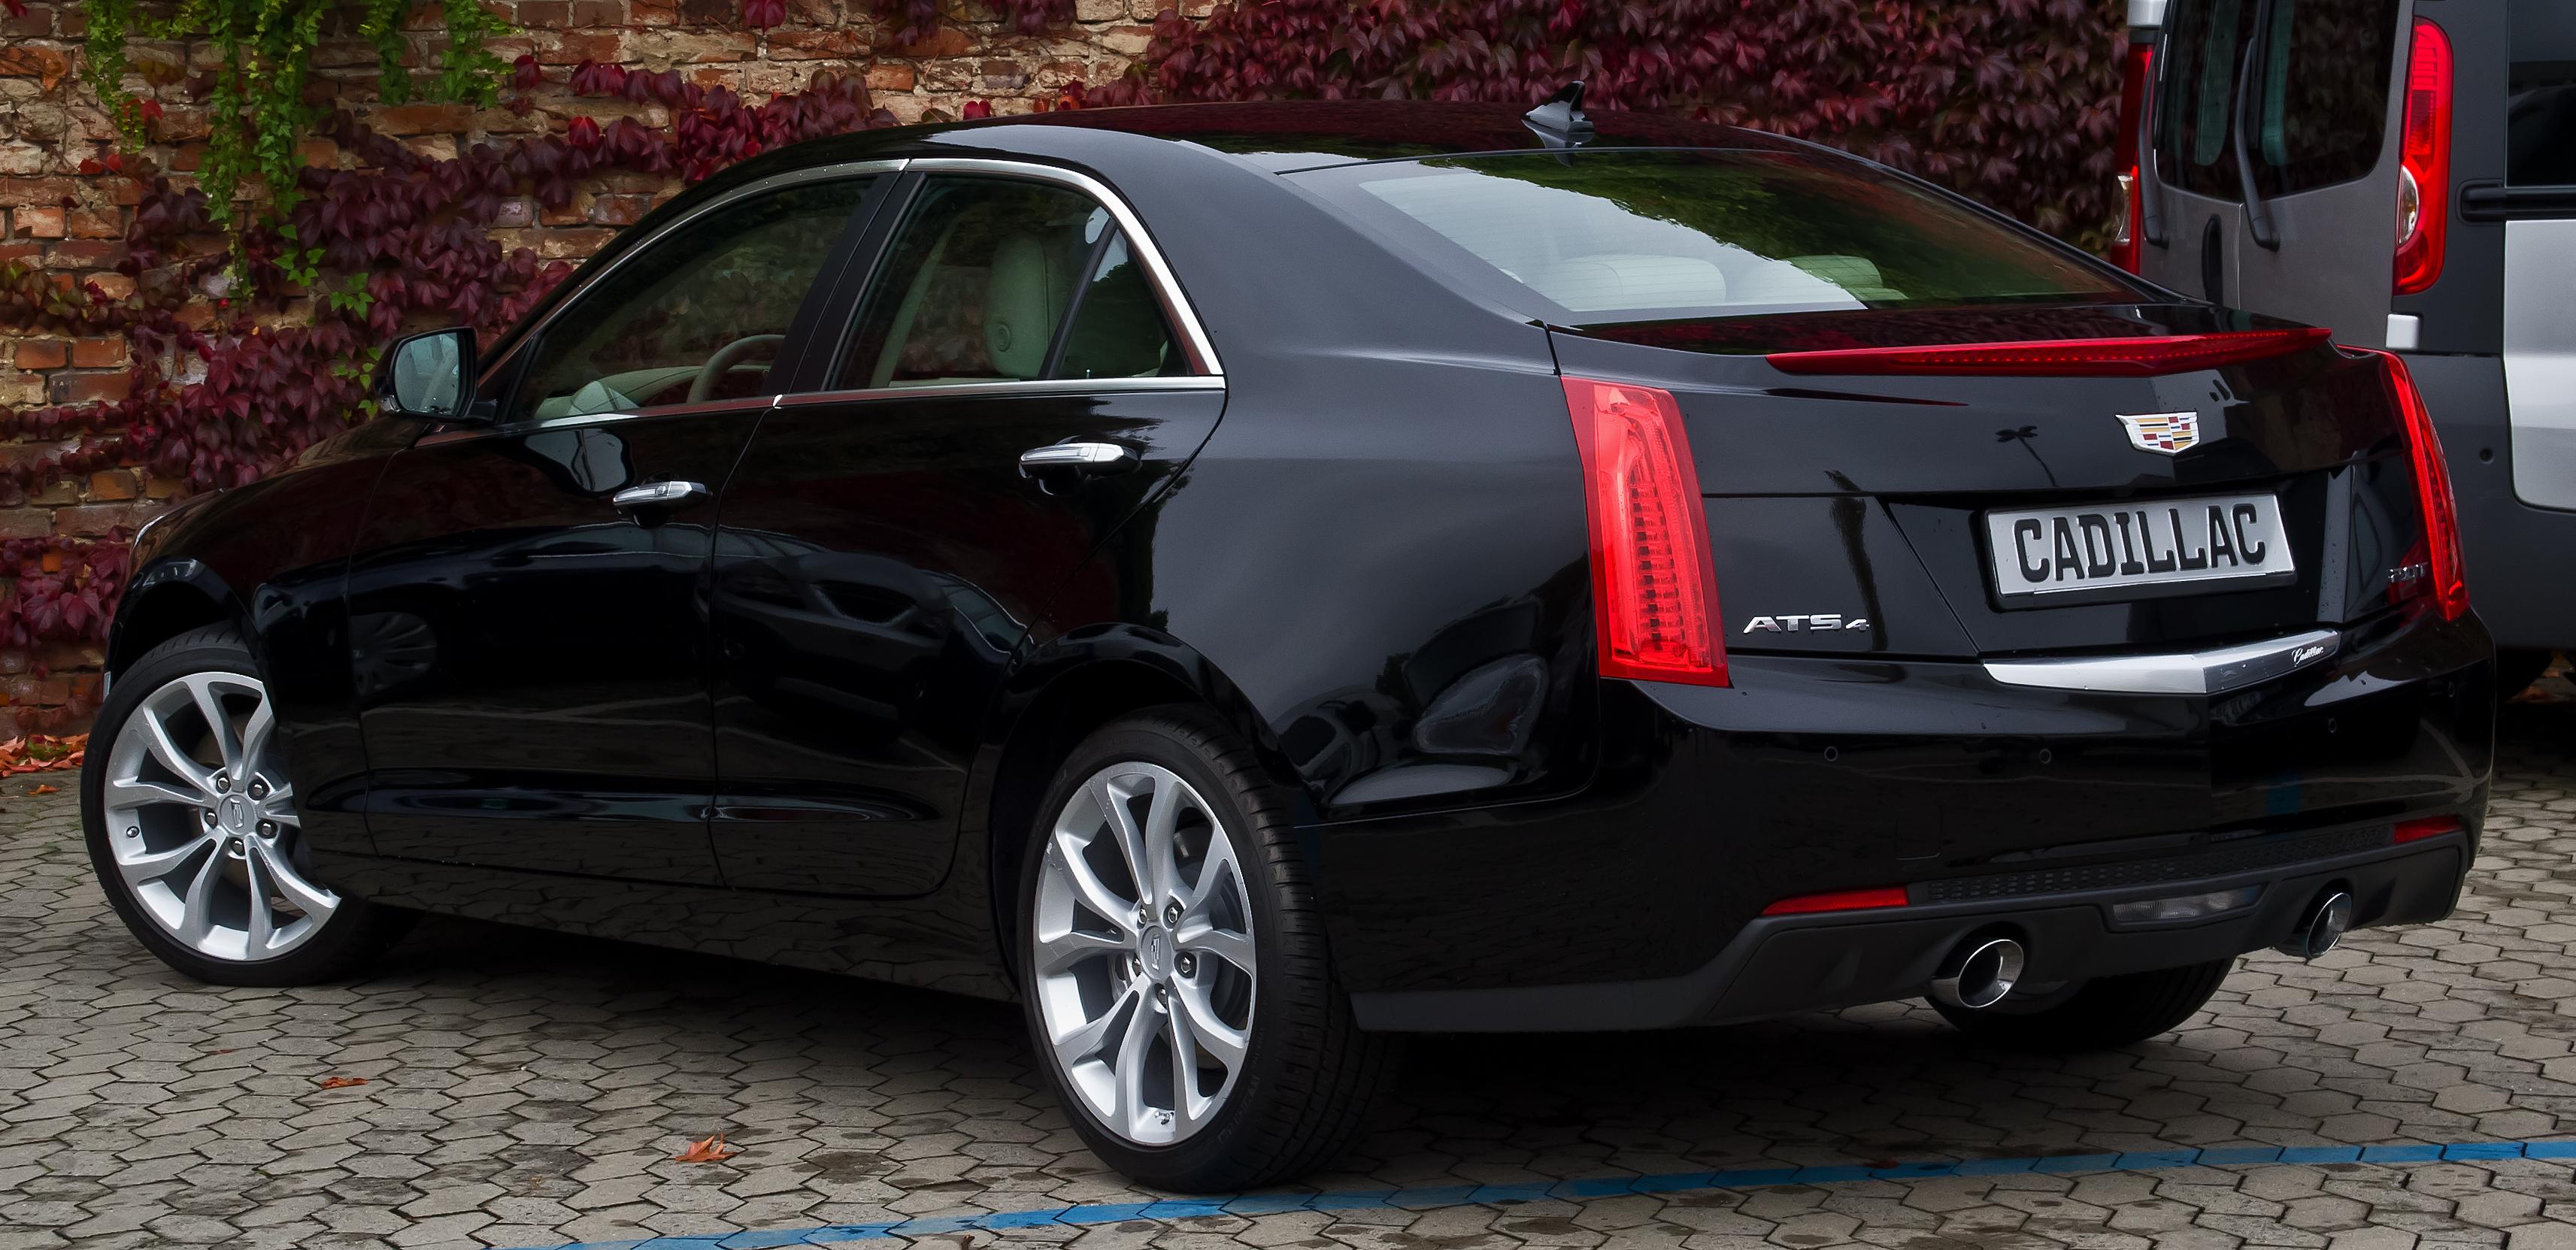 File Cadillac Ats 2 0 Turbo Awd Premium Heckansicht 16